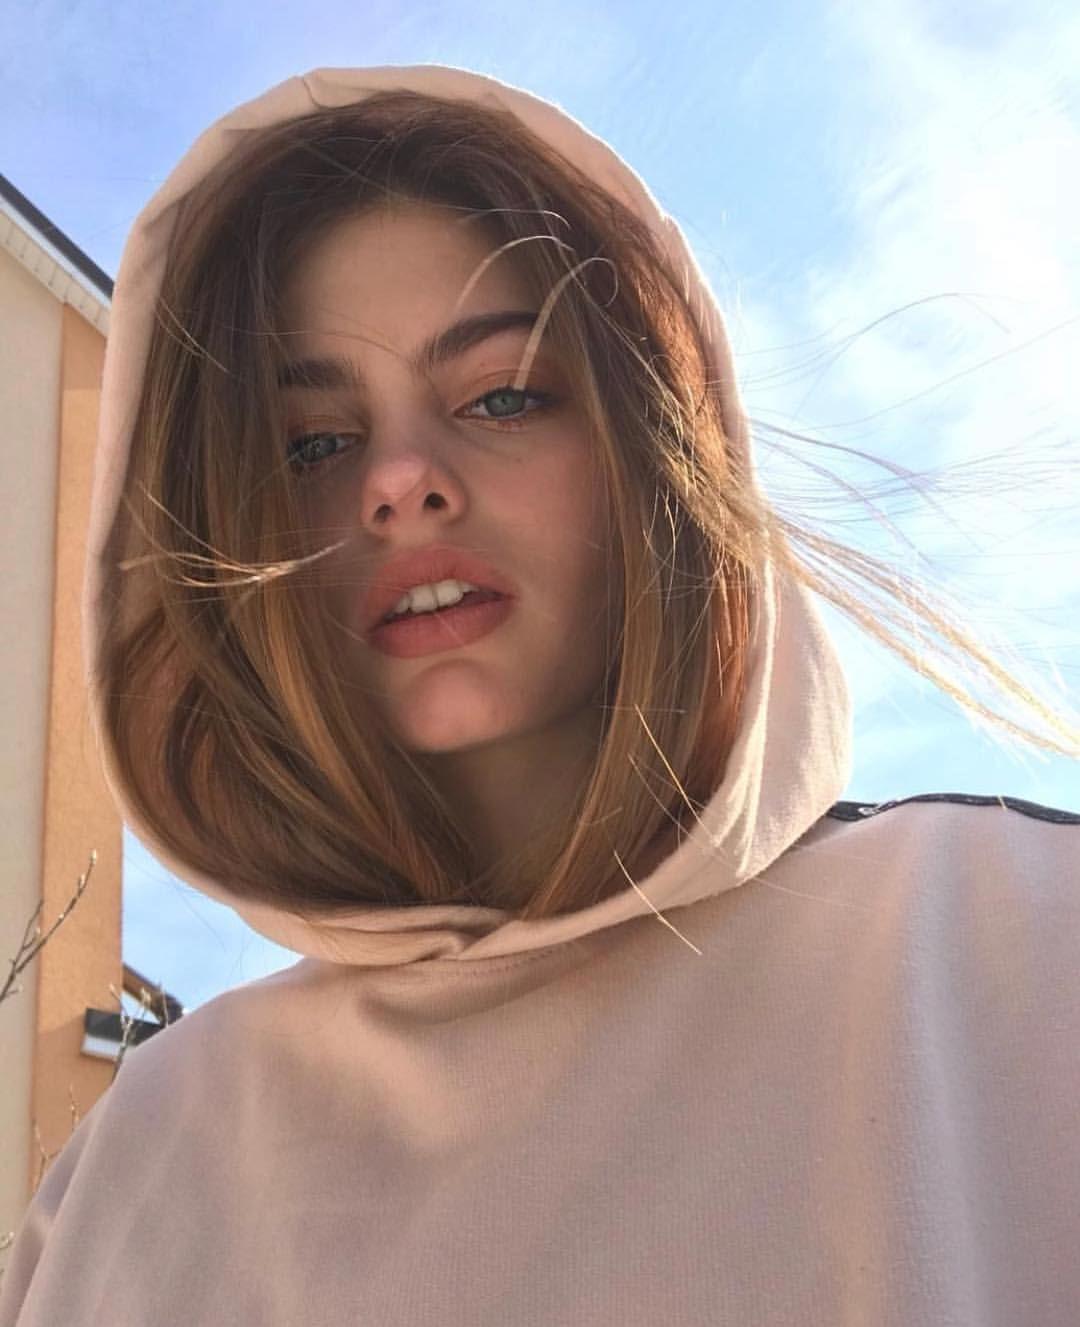 Snapchat Chloe Lewis nude (79 photo), Ass, Sideboobs, Feet, cleavage 2019